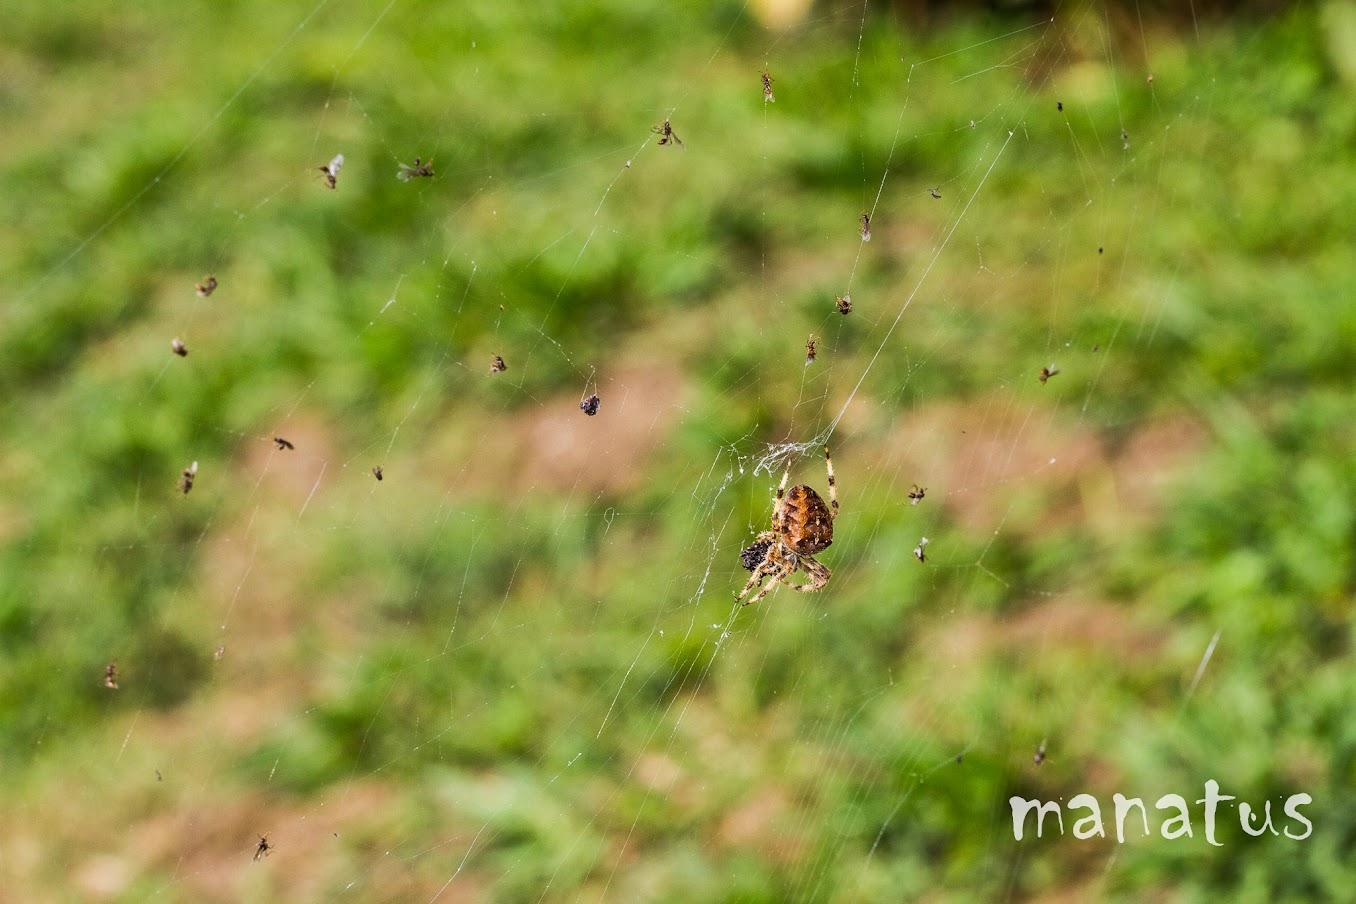 manatus foto blog tela de araña